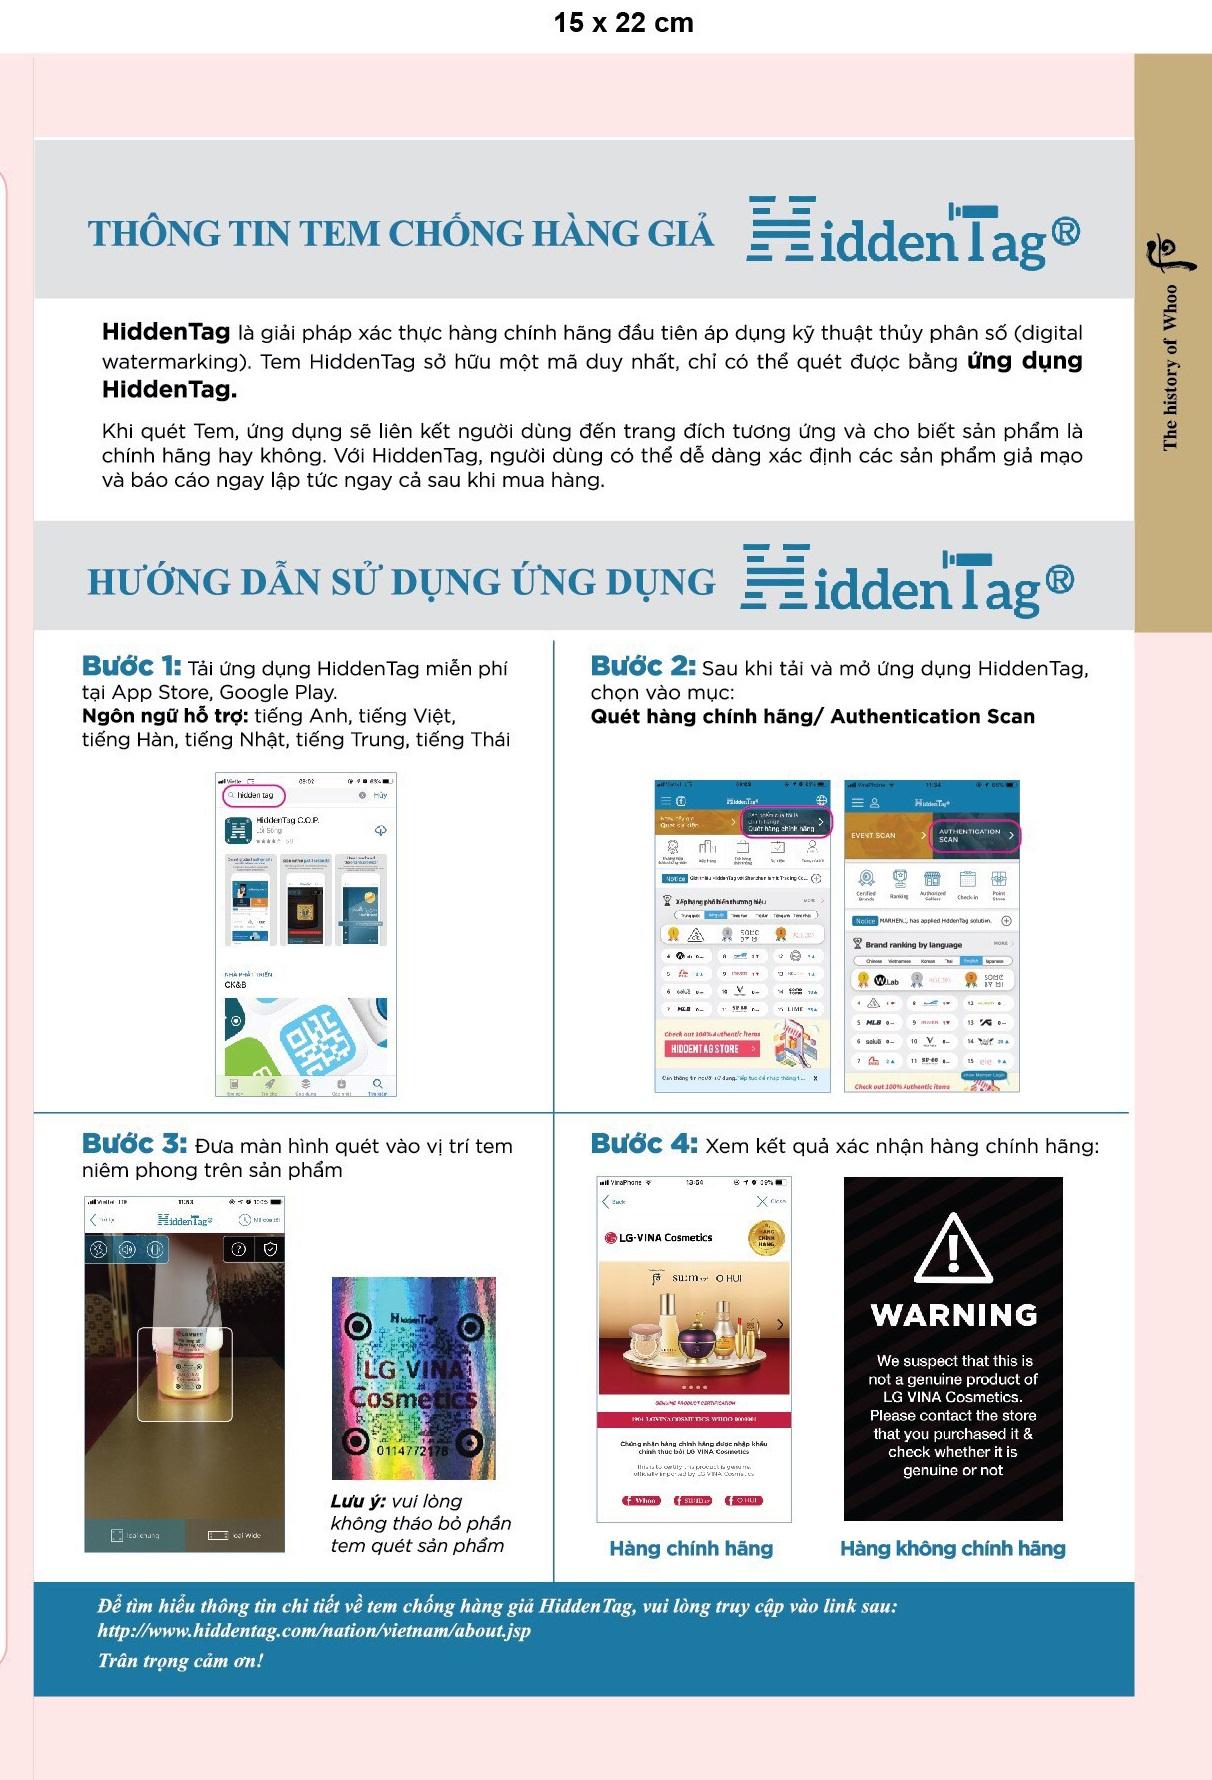 Nước tẩy trang 3 trong 1 Sum37 Skin Saver Essential Cleansing Water